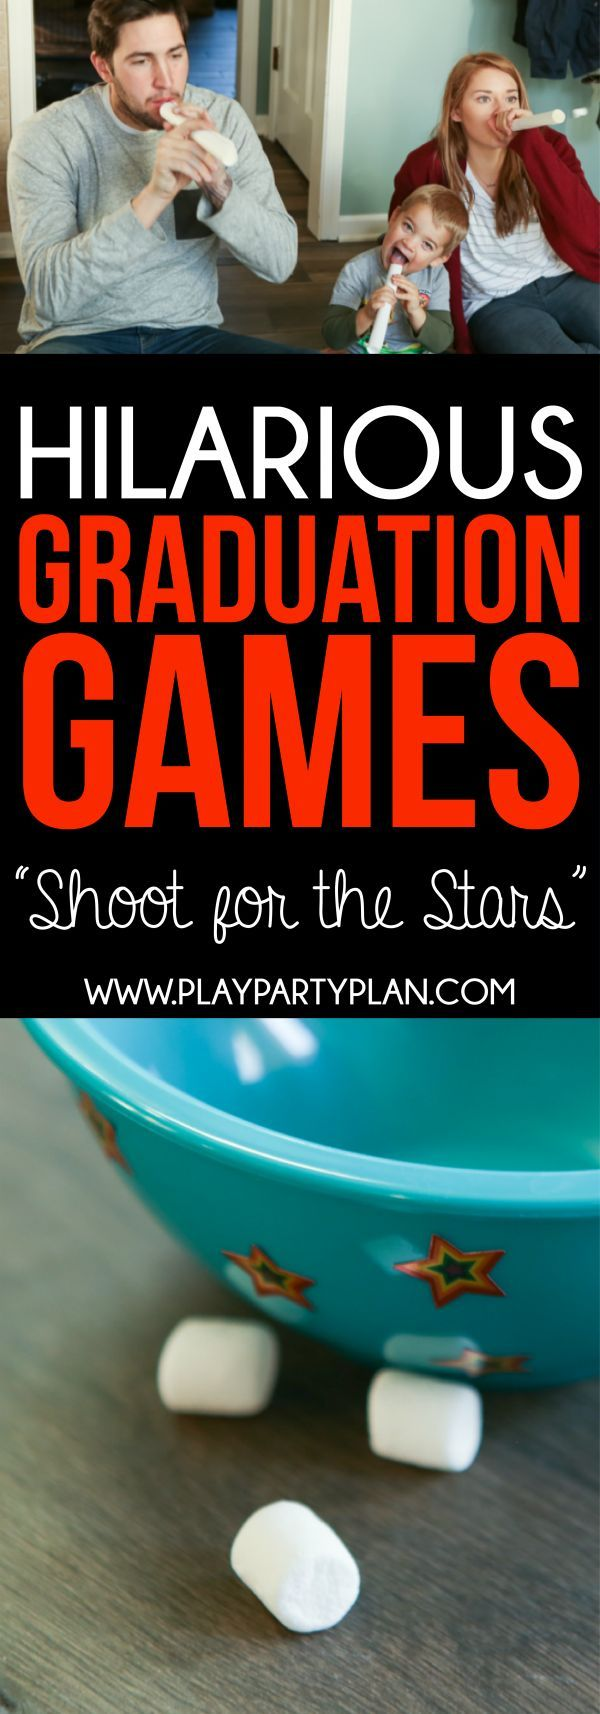 Mind Looking Graduation Party Games Graduation Party Party Ideas Things To Do At A Graduation Se Graduation Party Gamesare Some art Graduation Party Games